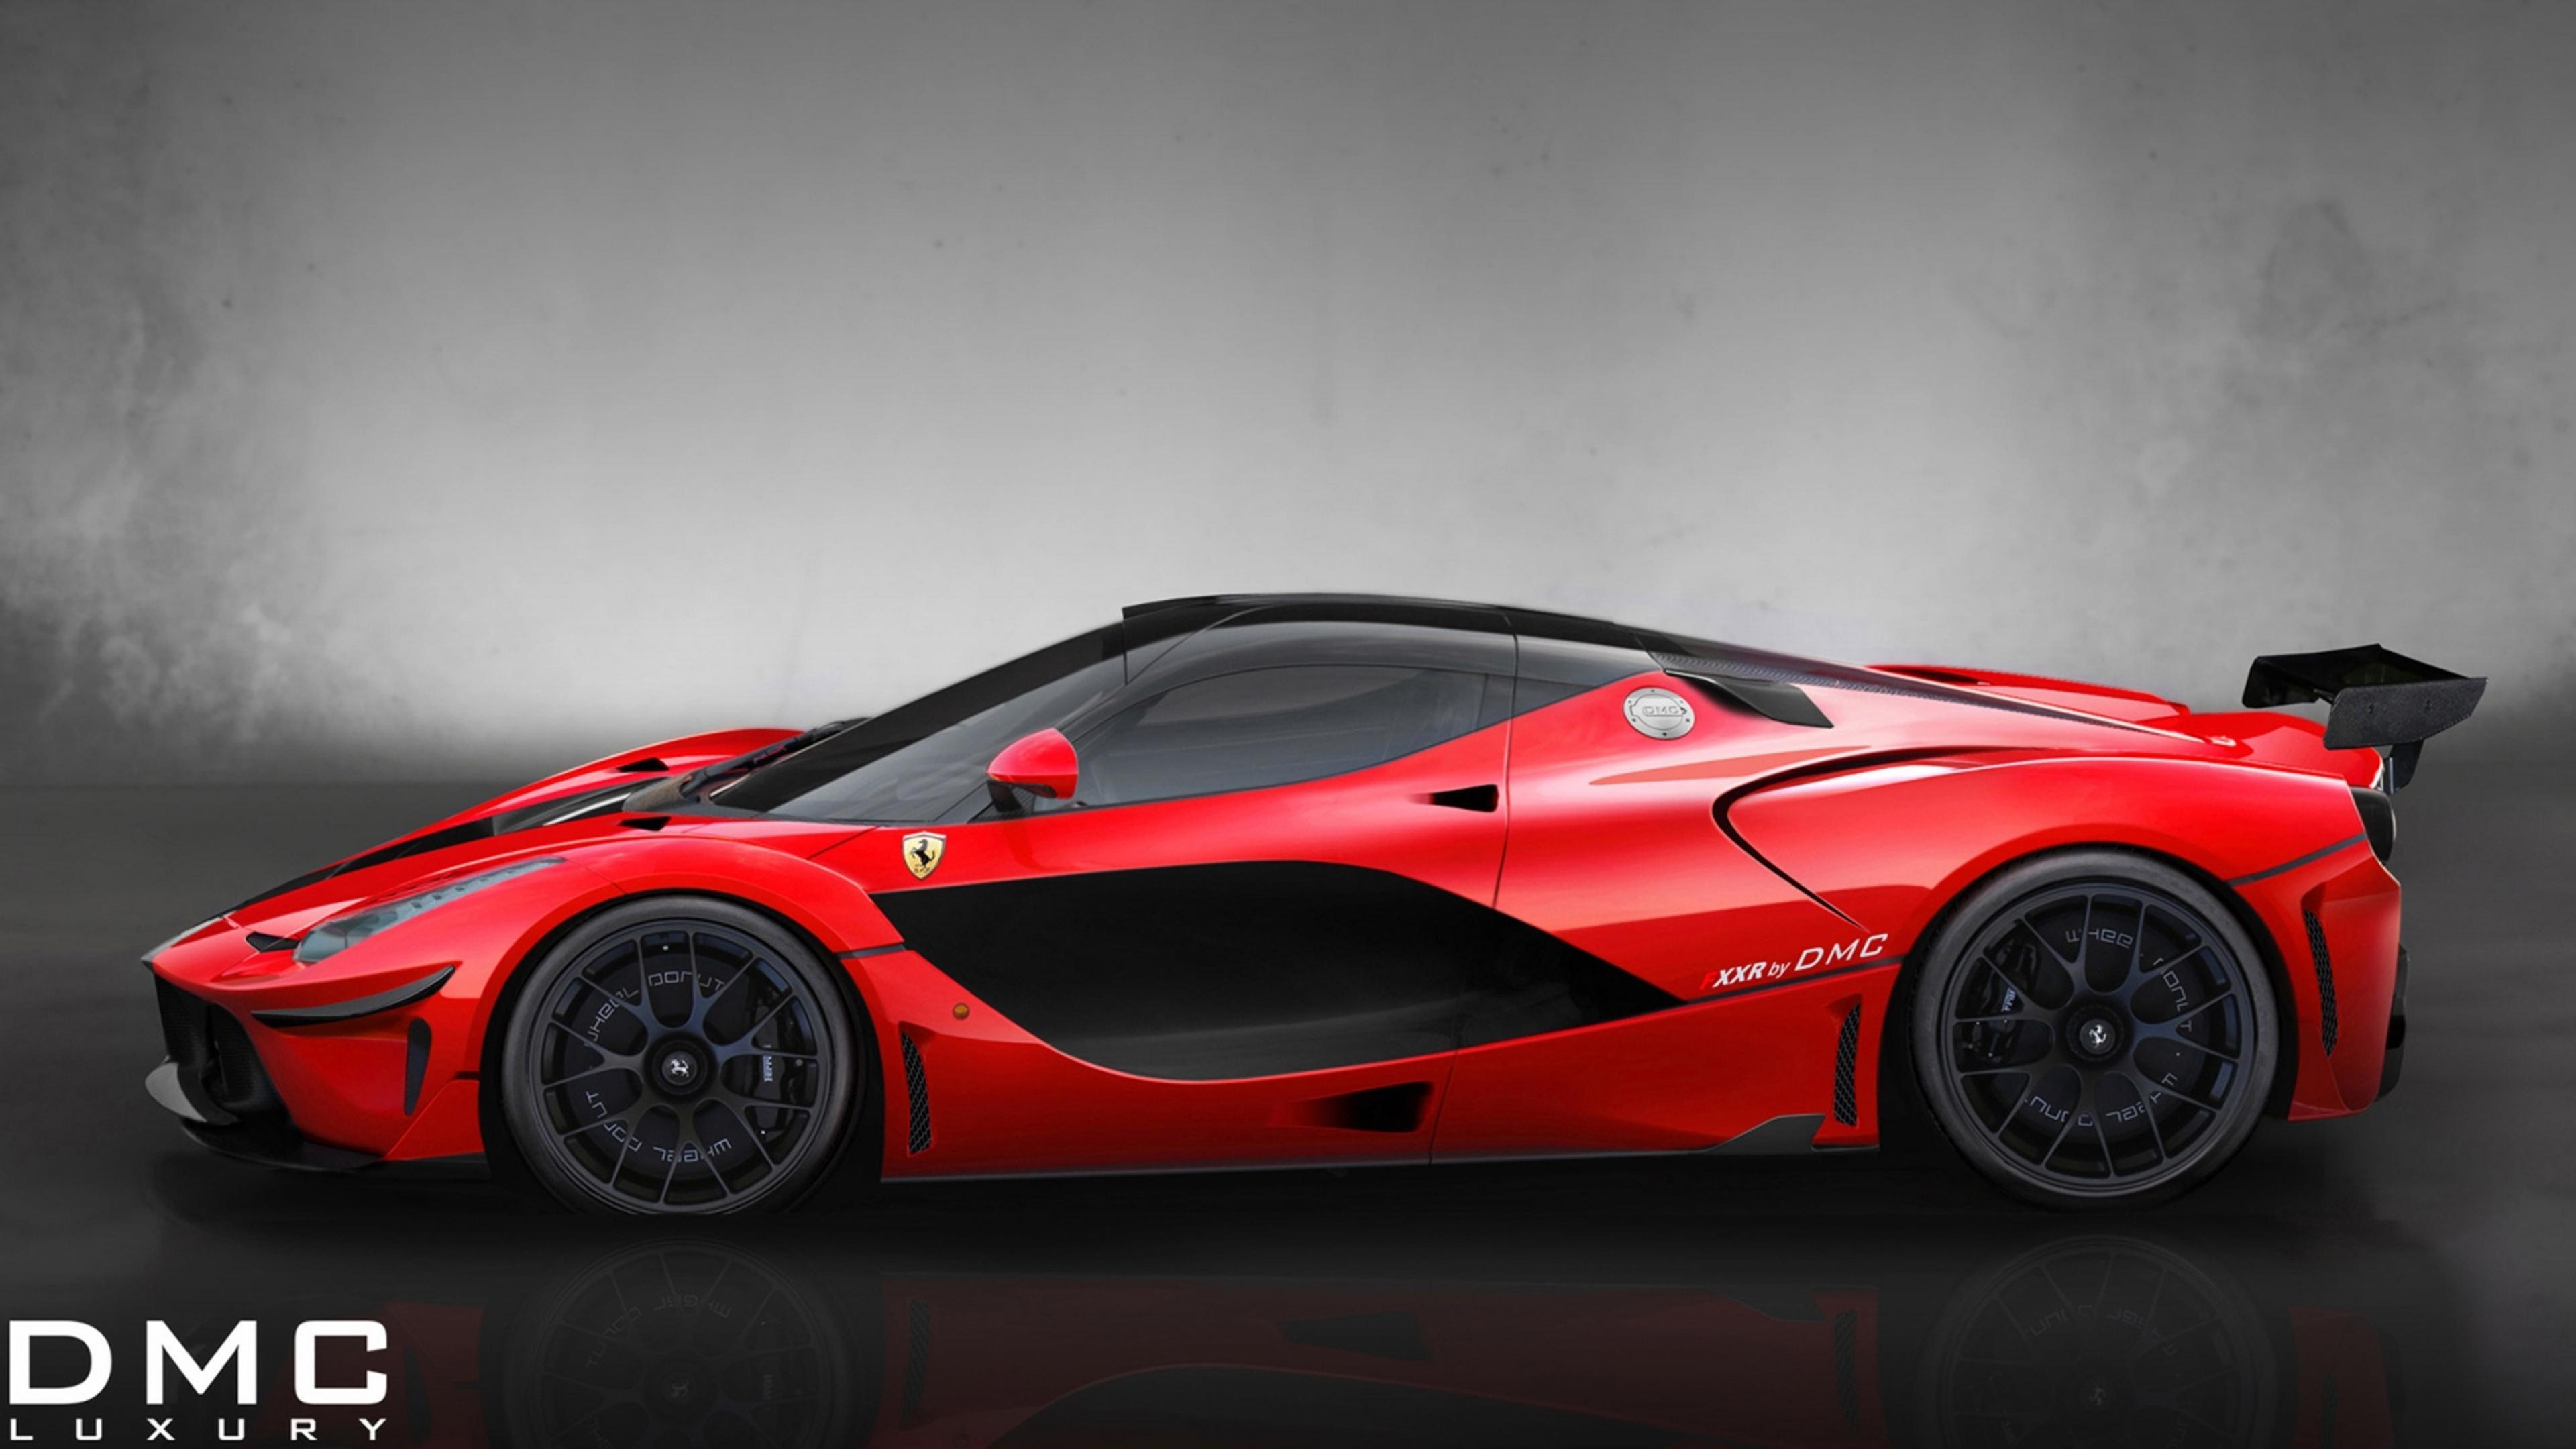 Ferrari Fxxr Side Red Sport Car Wallpaper Download 3840x2160